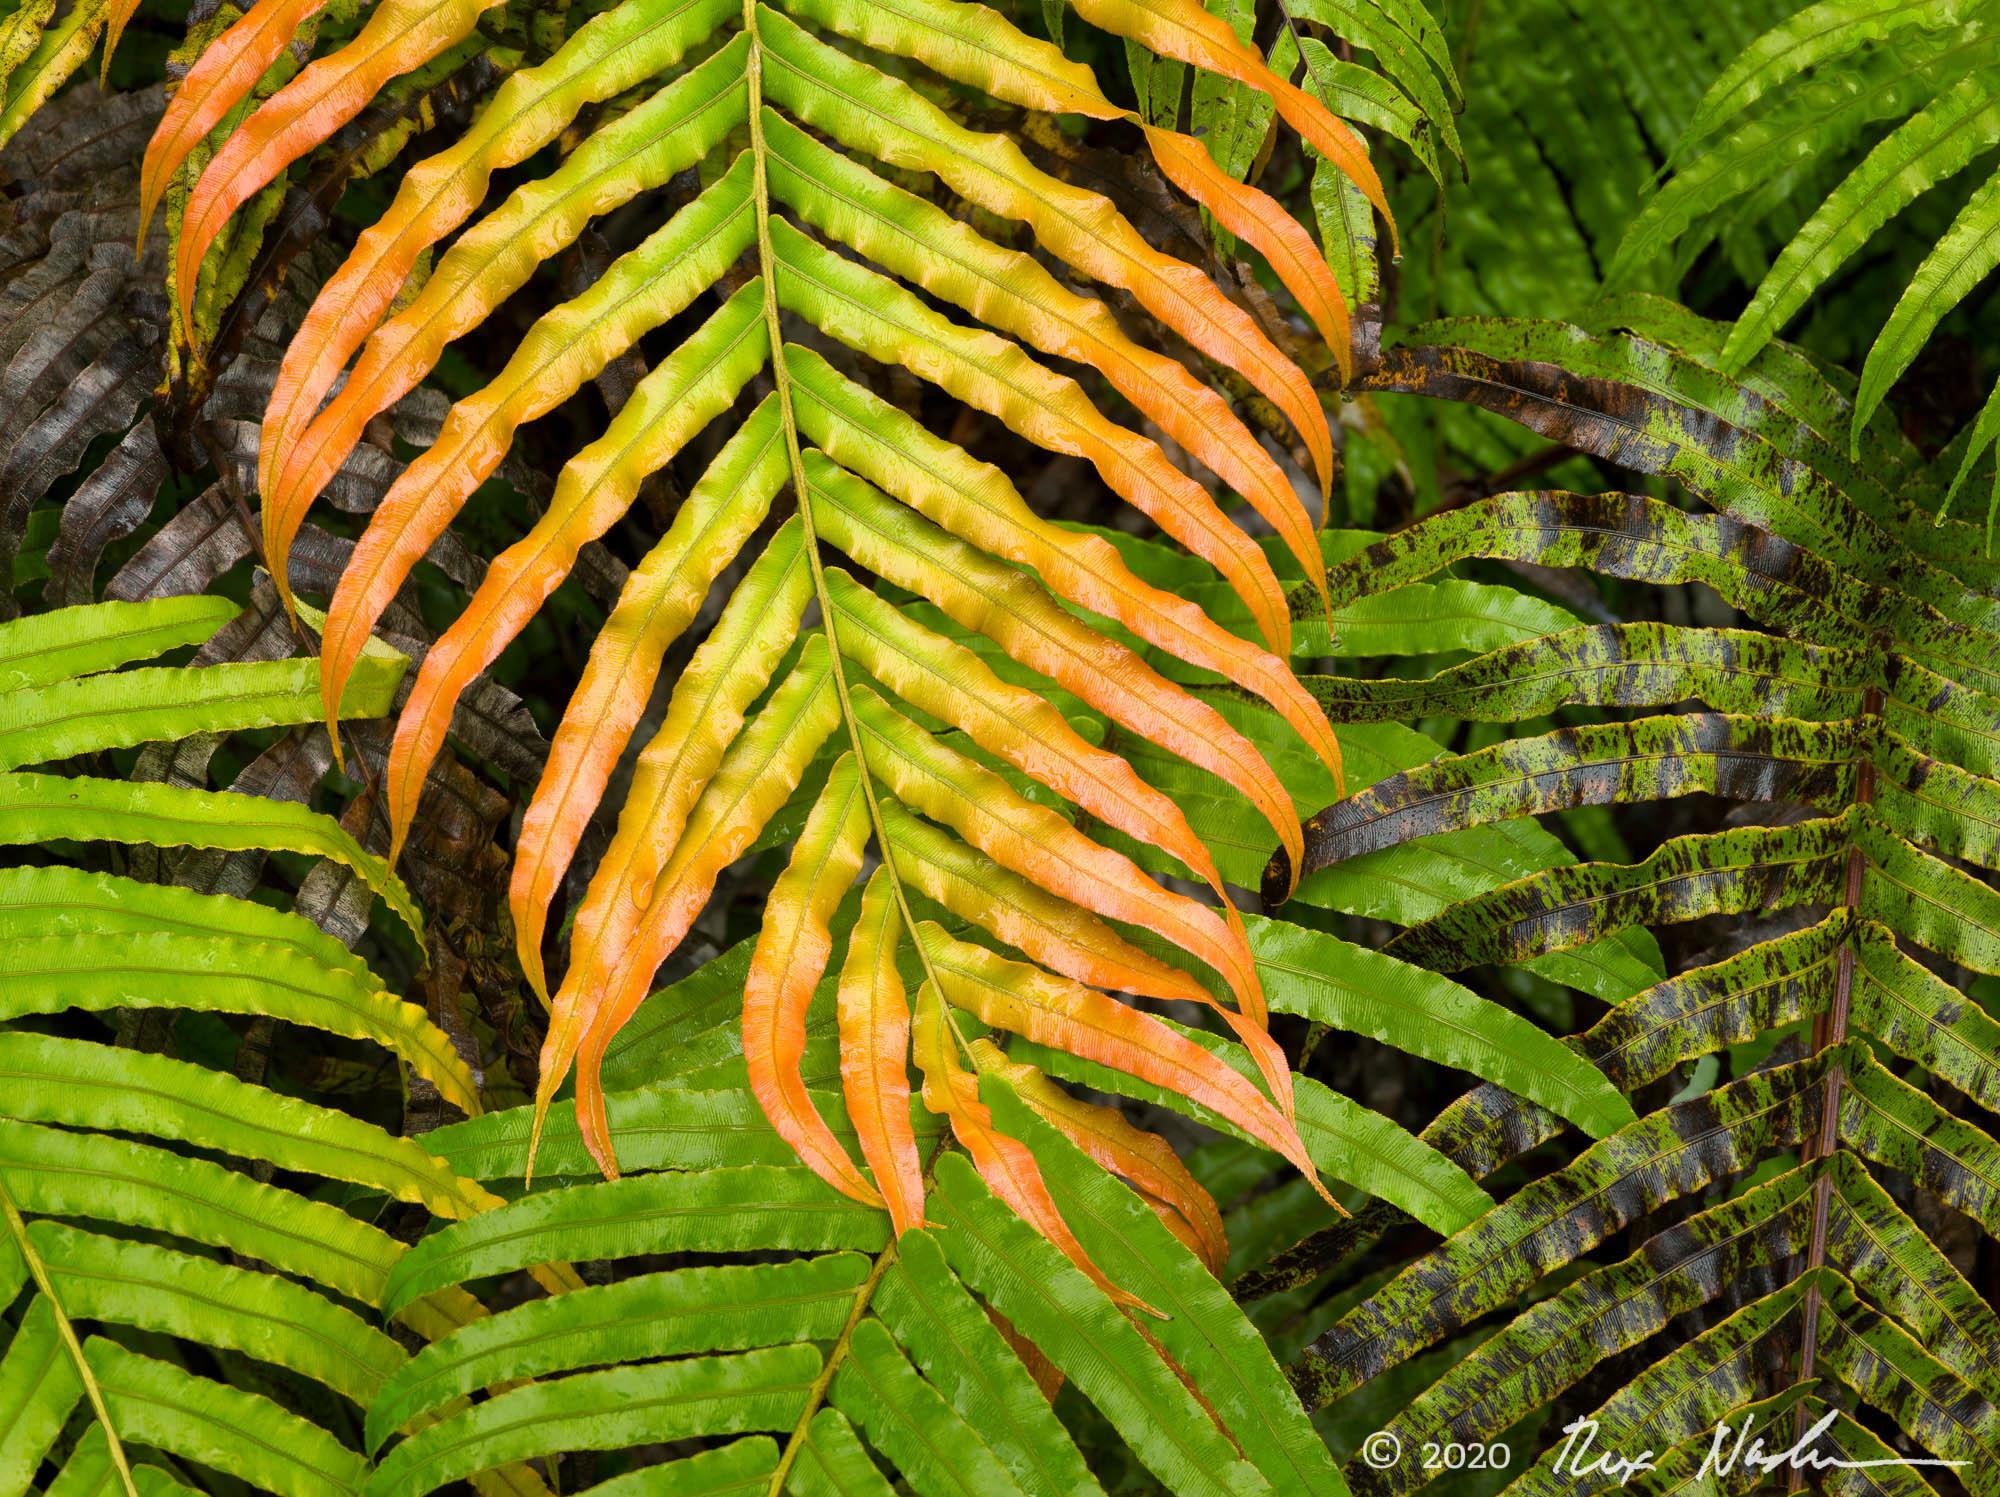 Multicolored Ferns - South Island, New Zealand